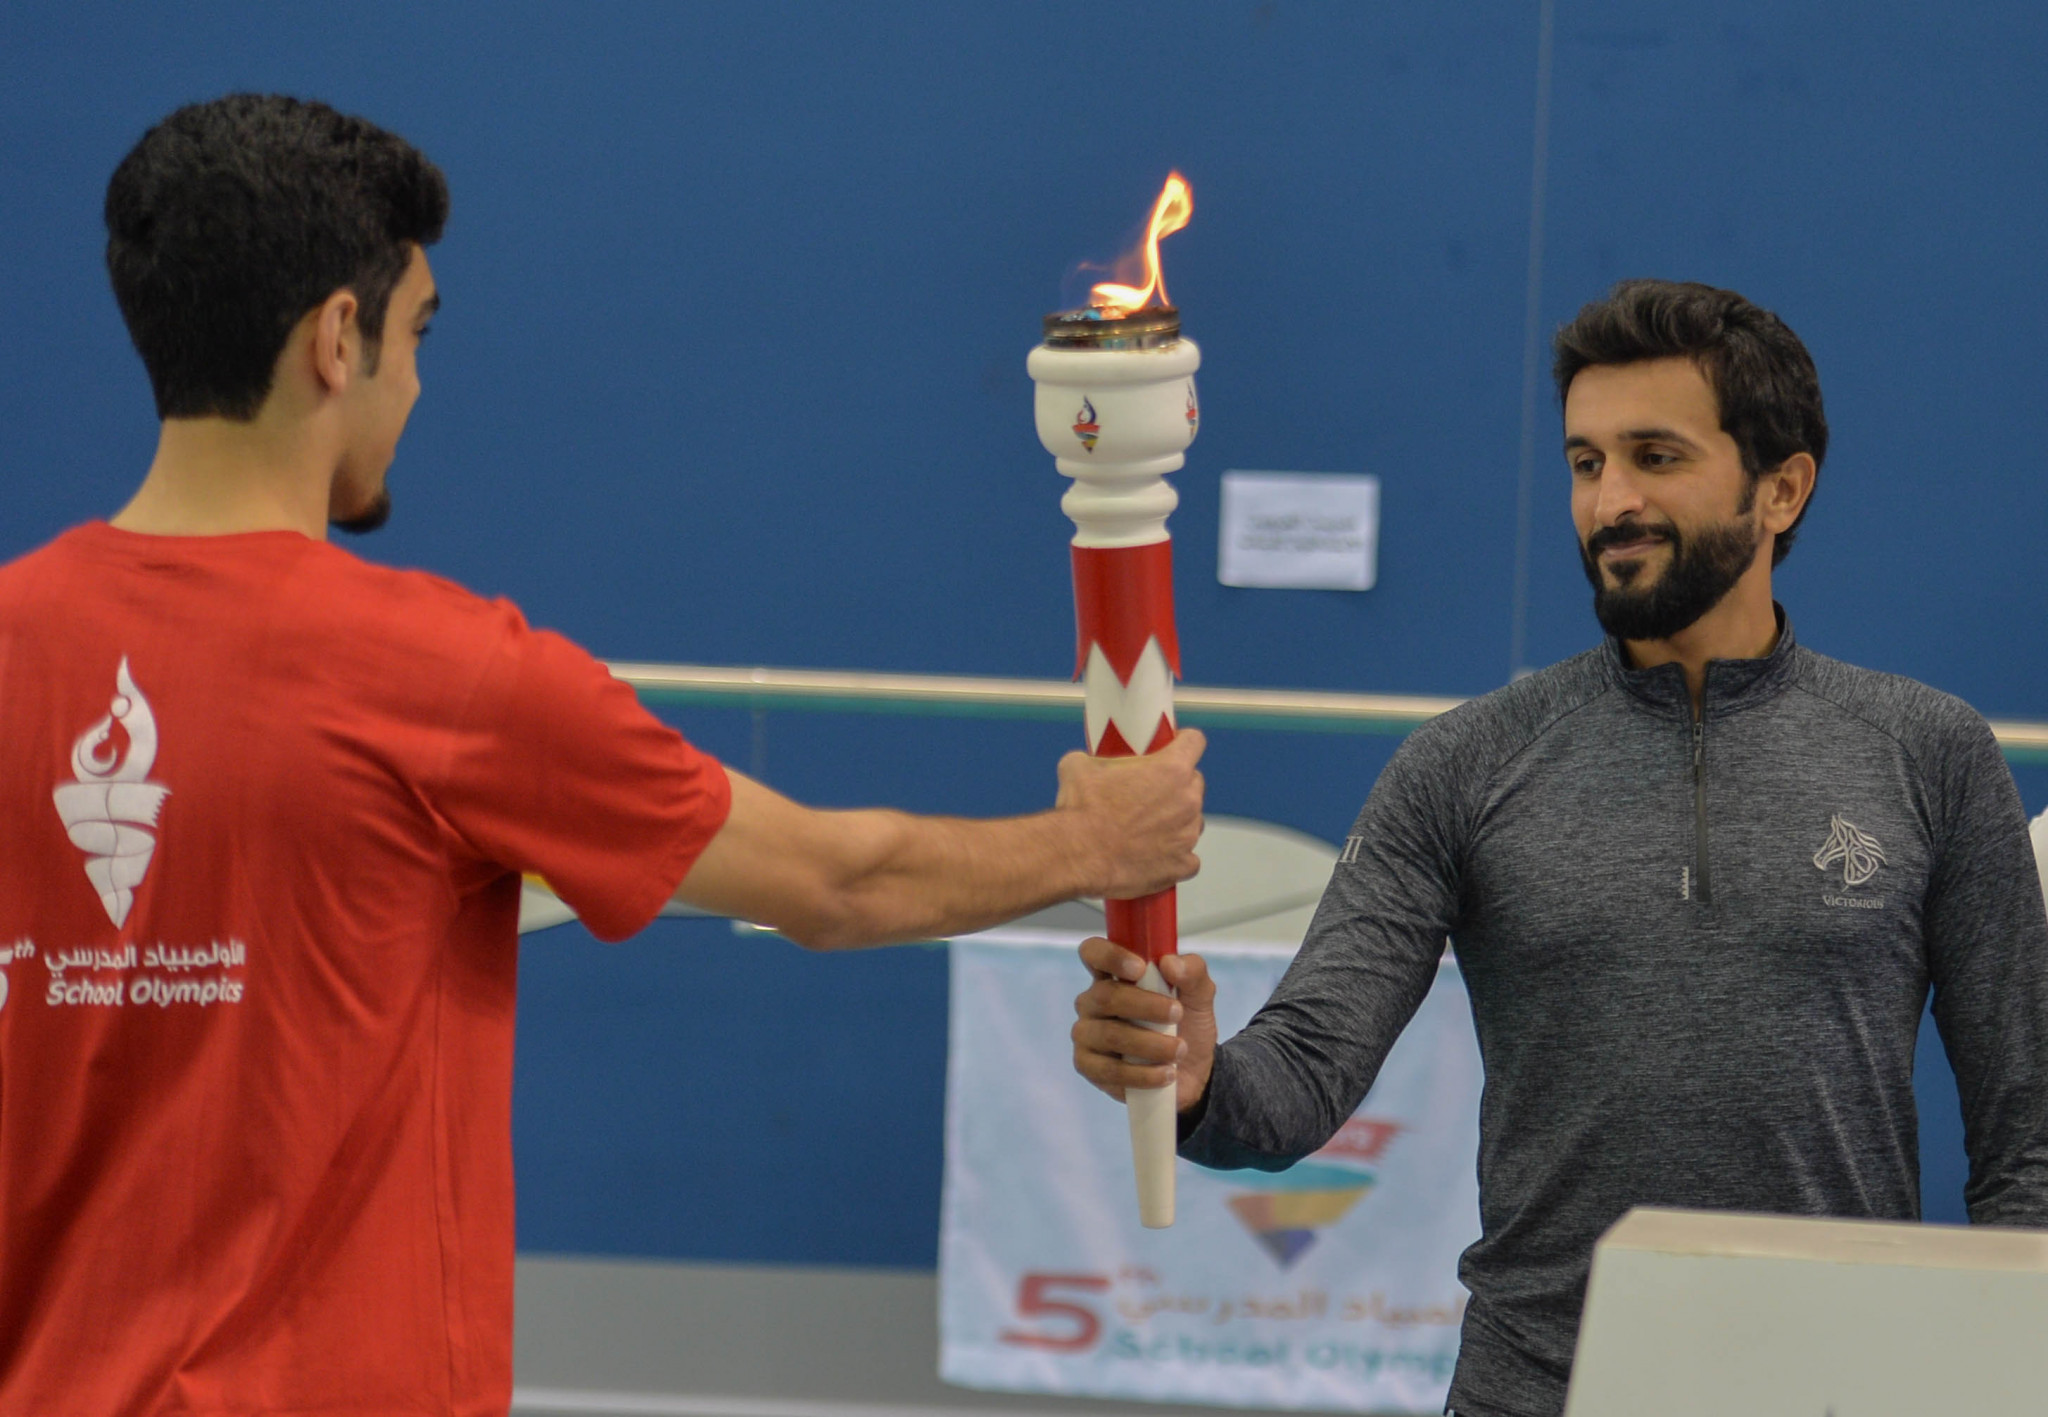 BOC President Shaikh Nasser bin Hamad Al Khalifa lit a dedicated Torch to declare the School Mini Olympics open ©BOC